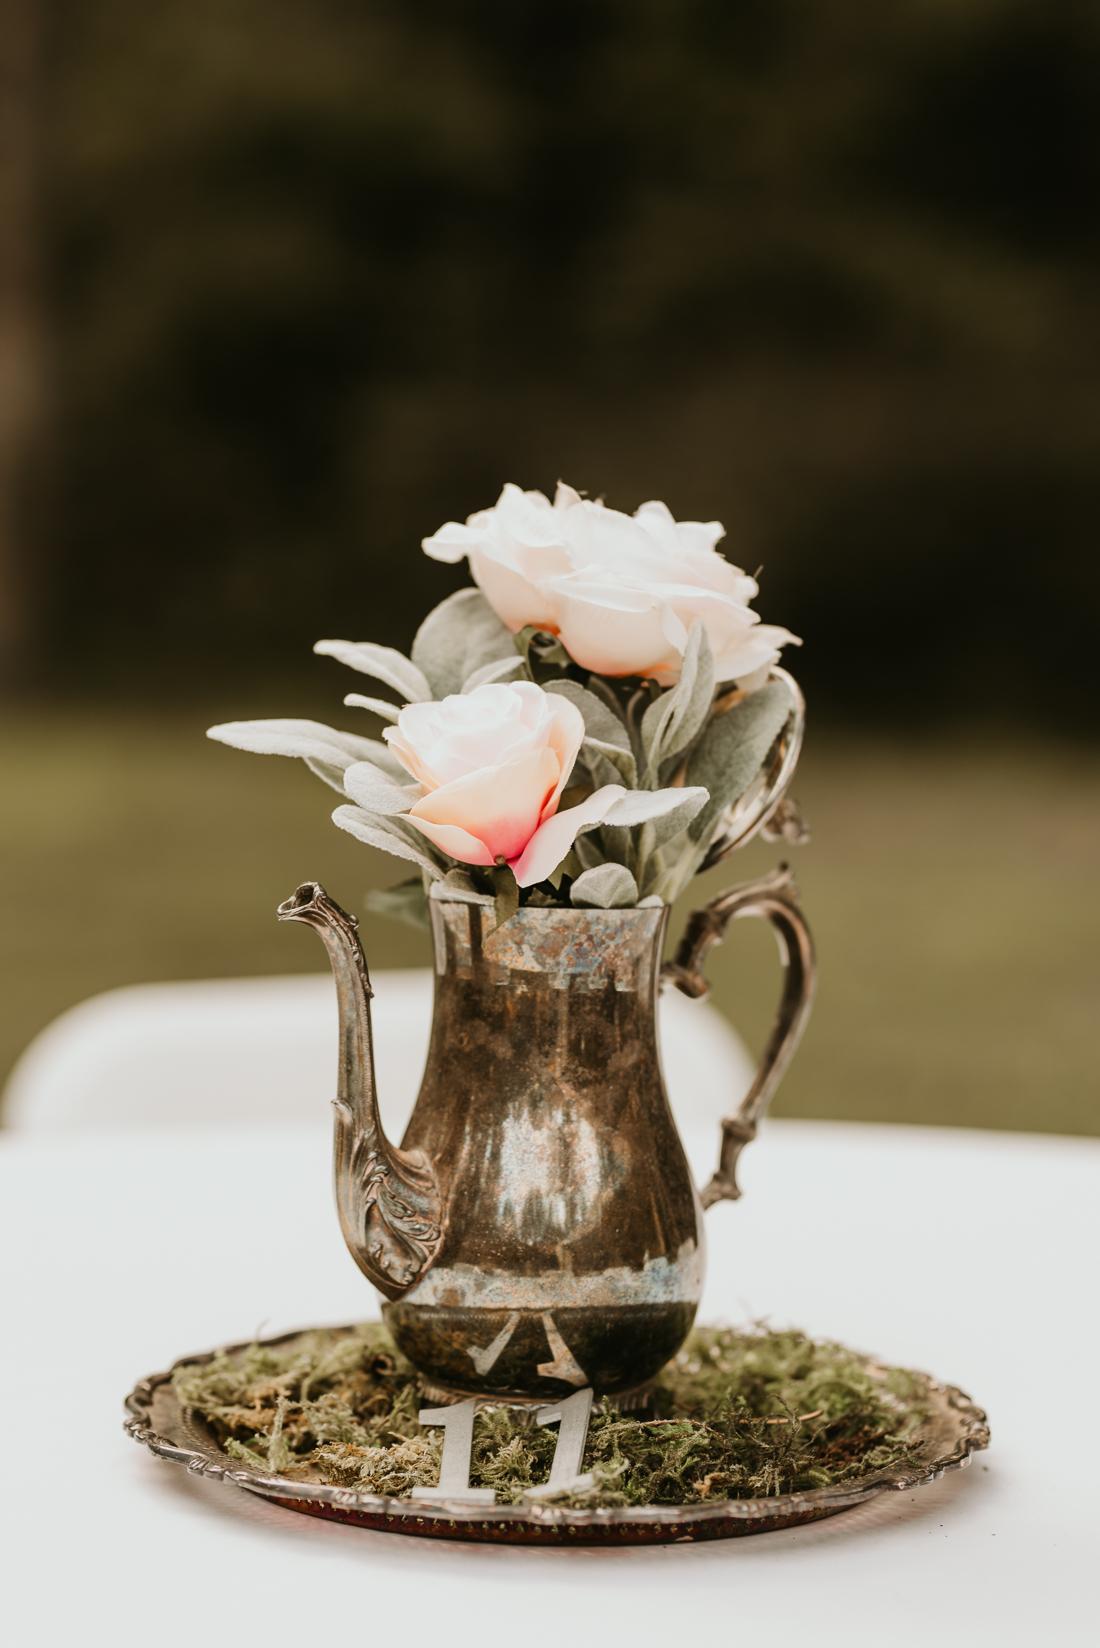 olivia_zay_wedding_09_2018-7461.jpg